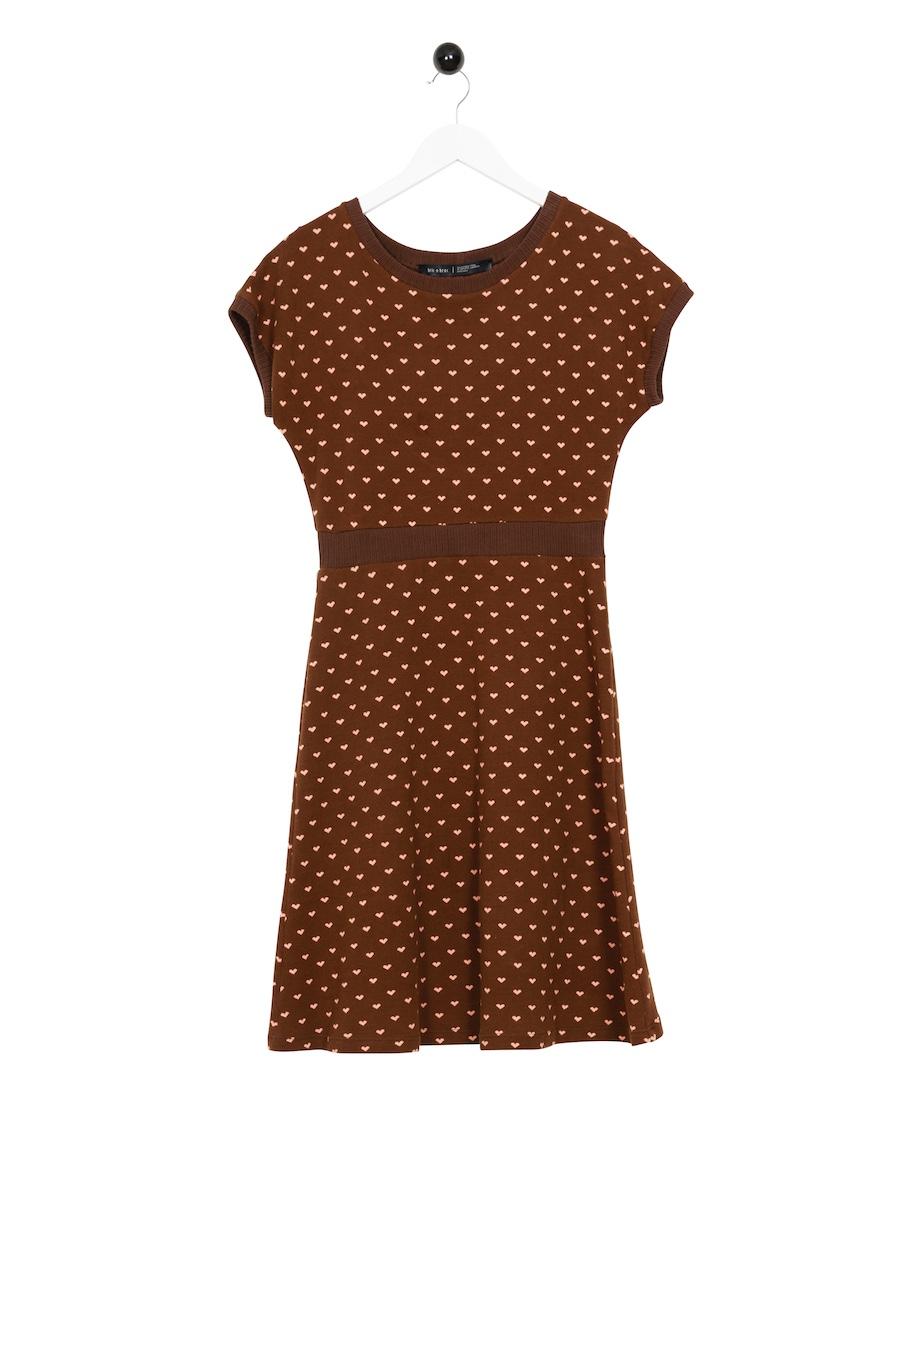 Ardenner Dress